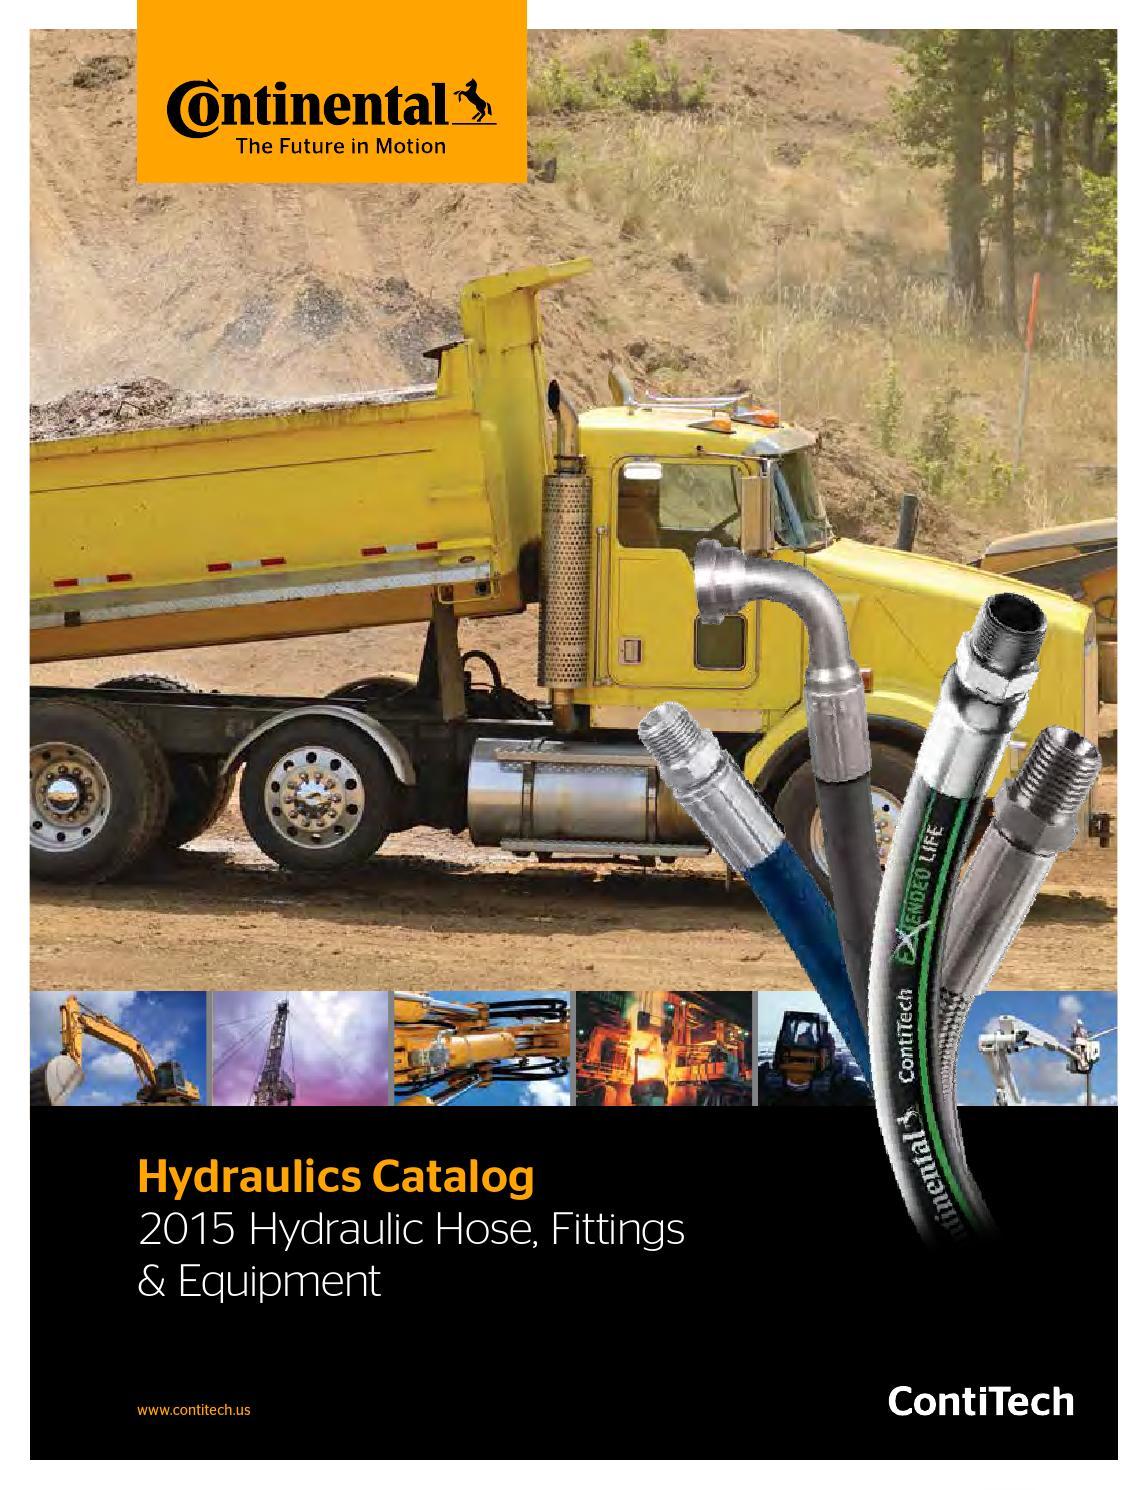 Continental-Hydraulics Catalog 2015 Hydraulic Hose, Fittings